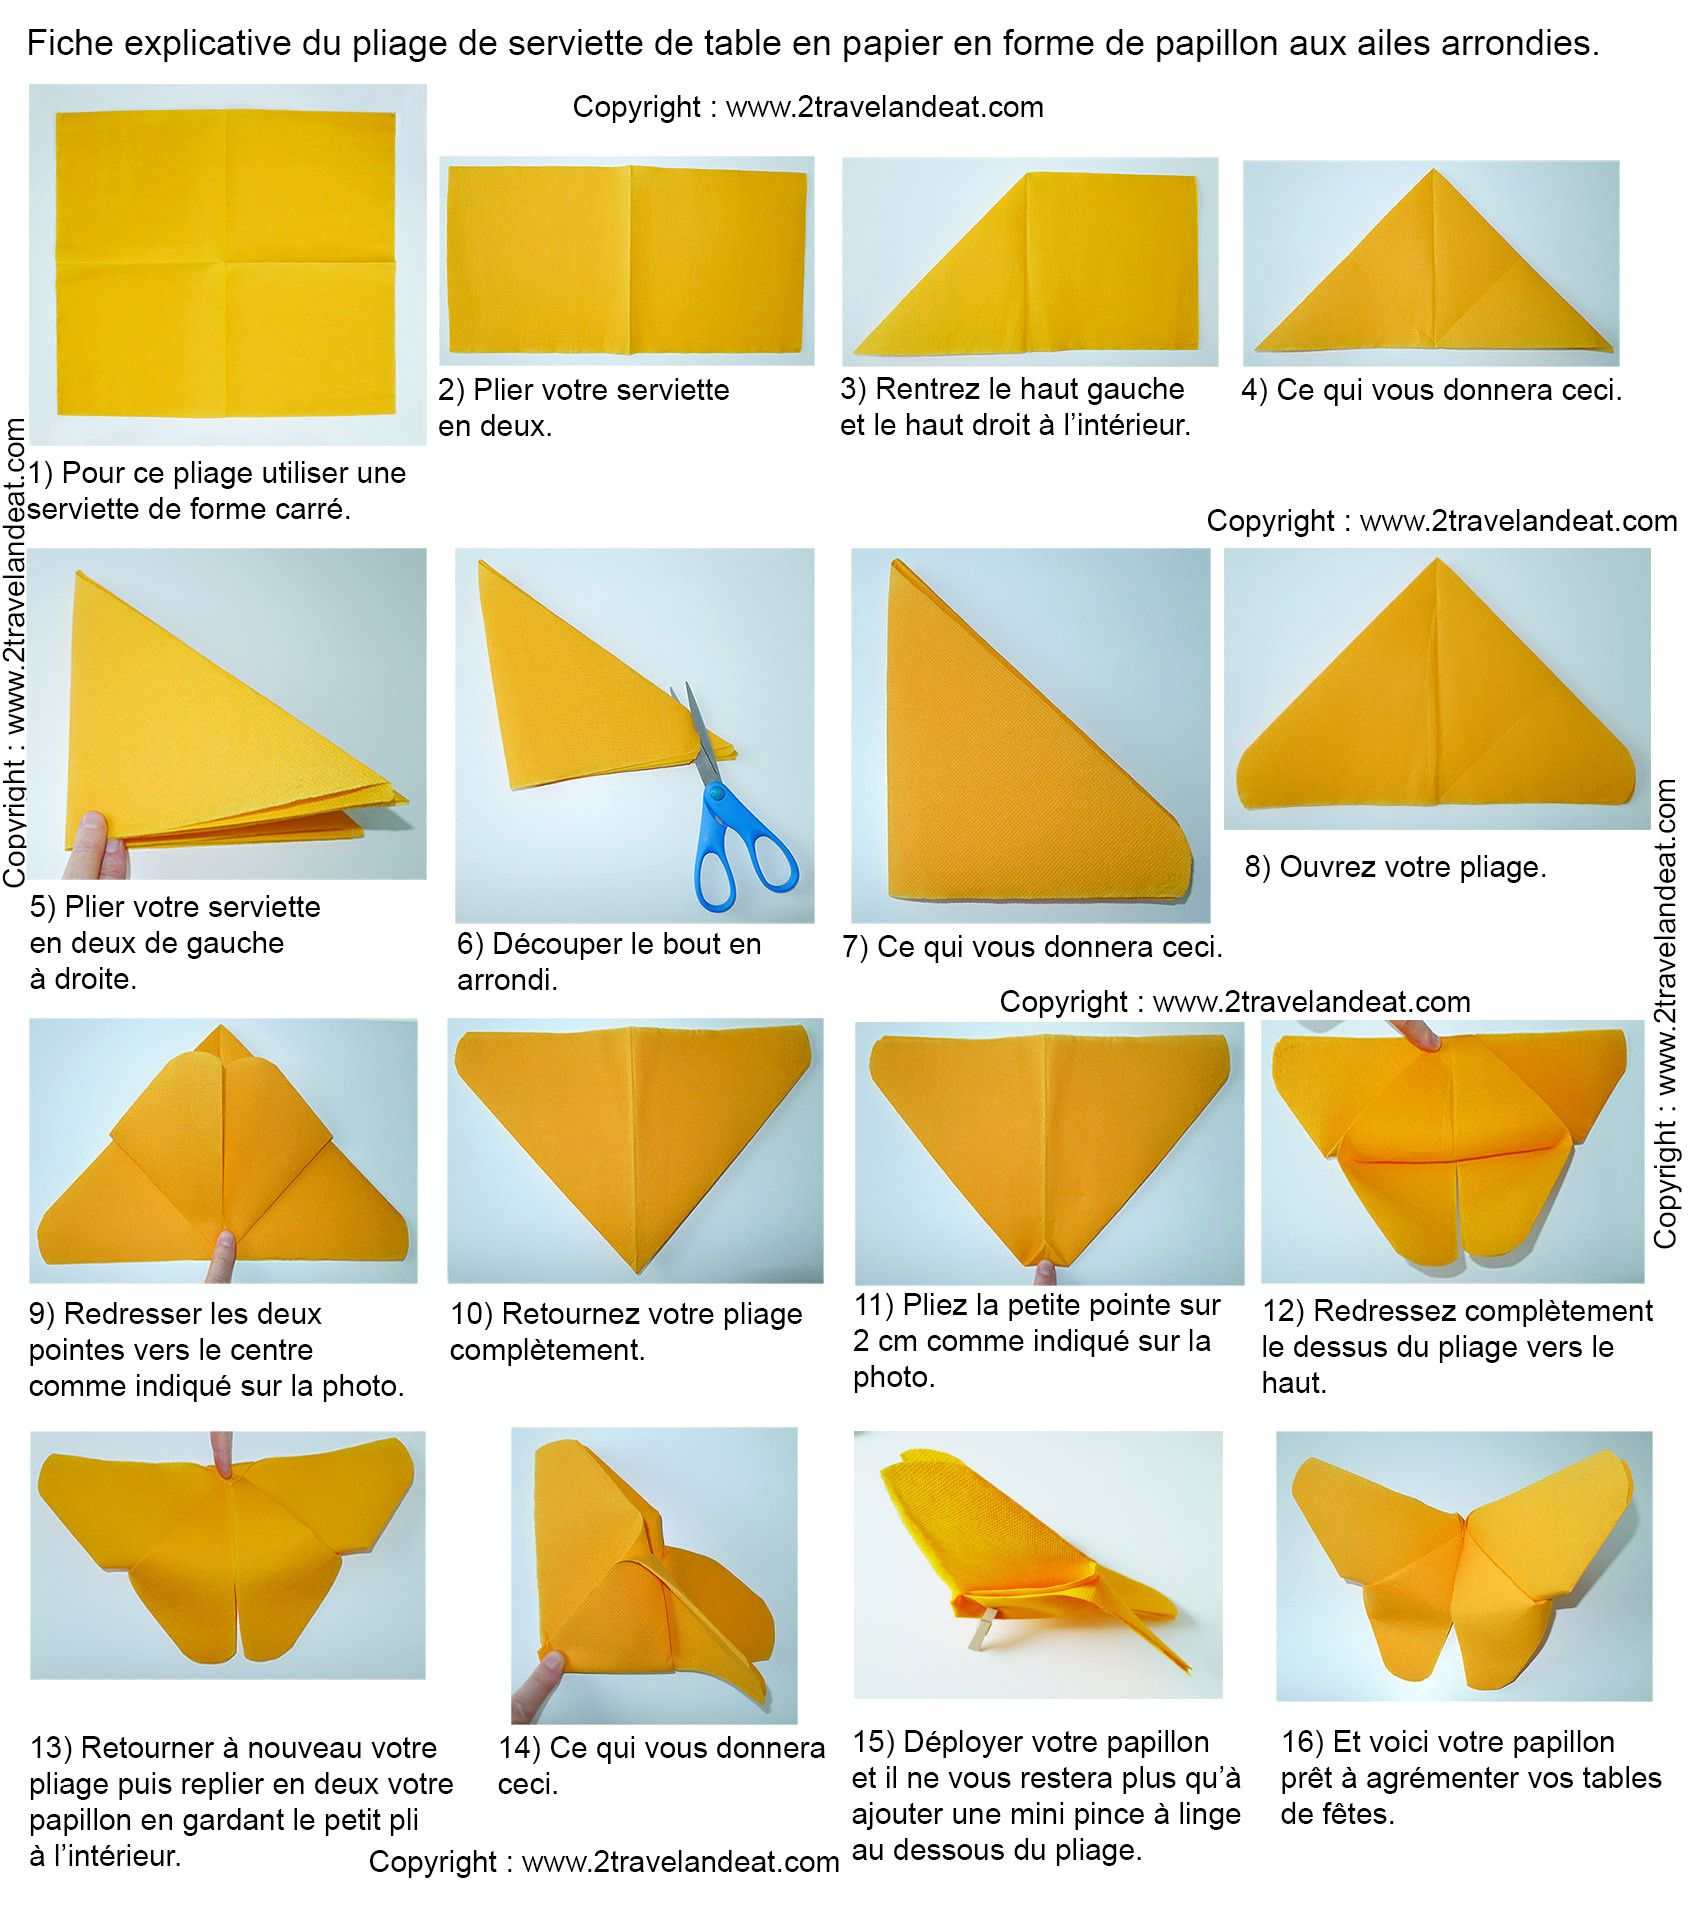 Origami Facile De Papillon Pliage Serviette Pliage Serviette Papier Serviette De Table